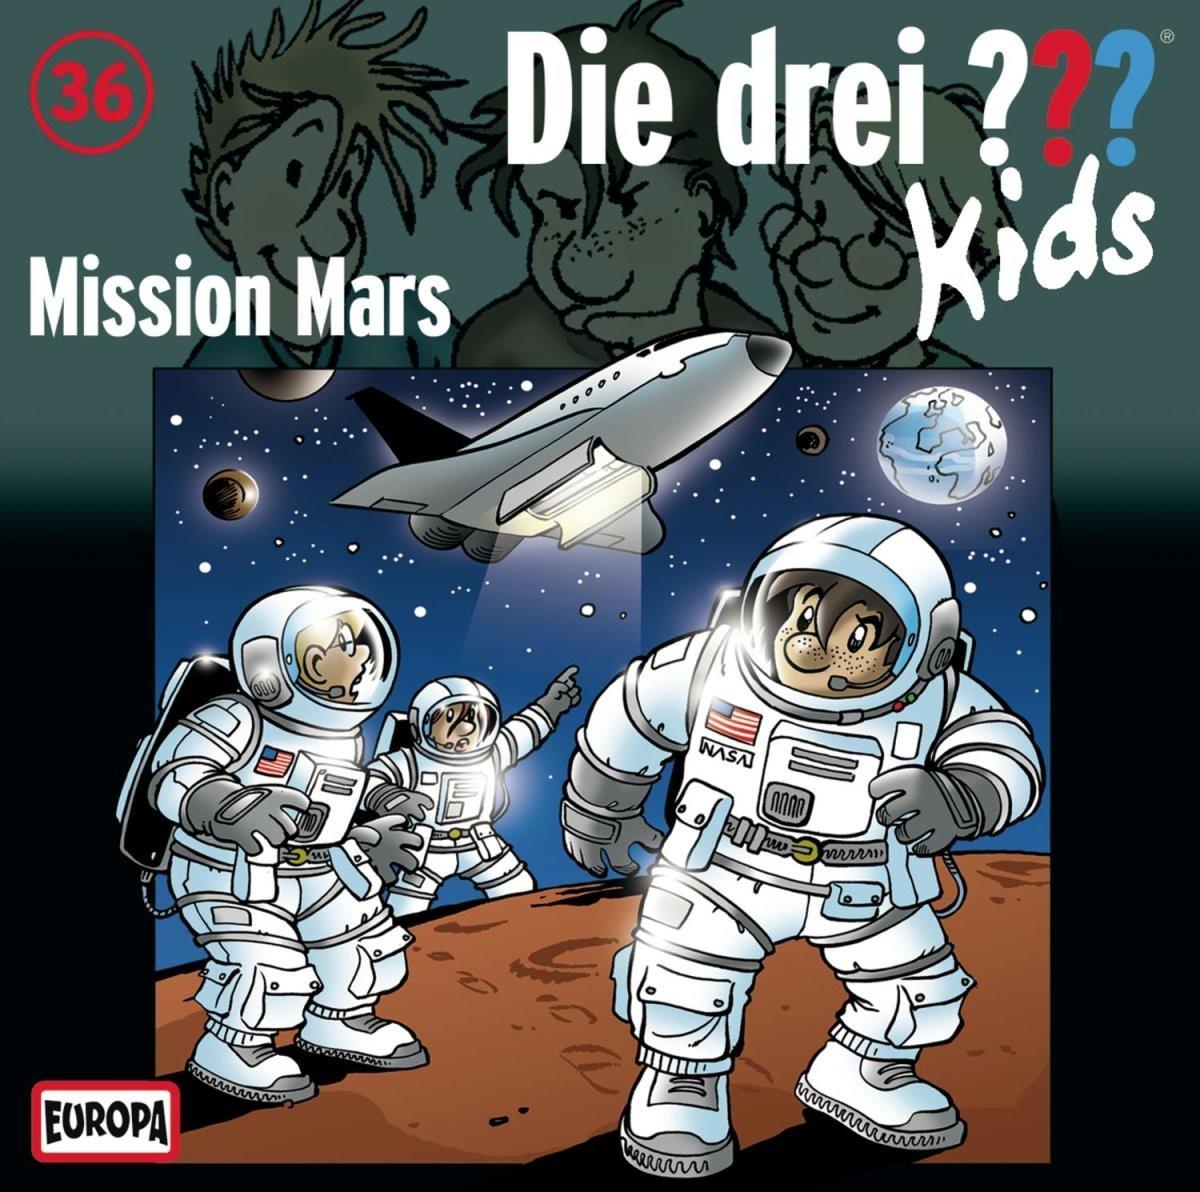 Die drei ??? Kids Folge 36 Mission Mars